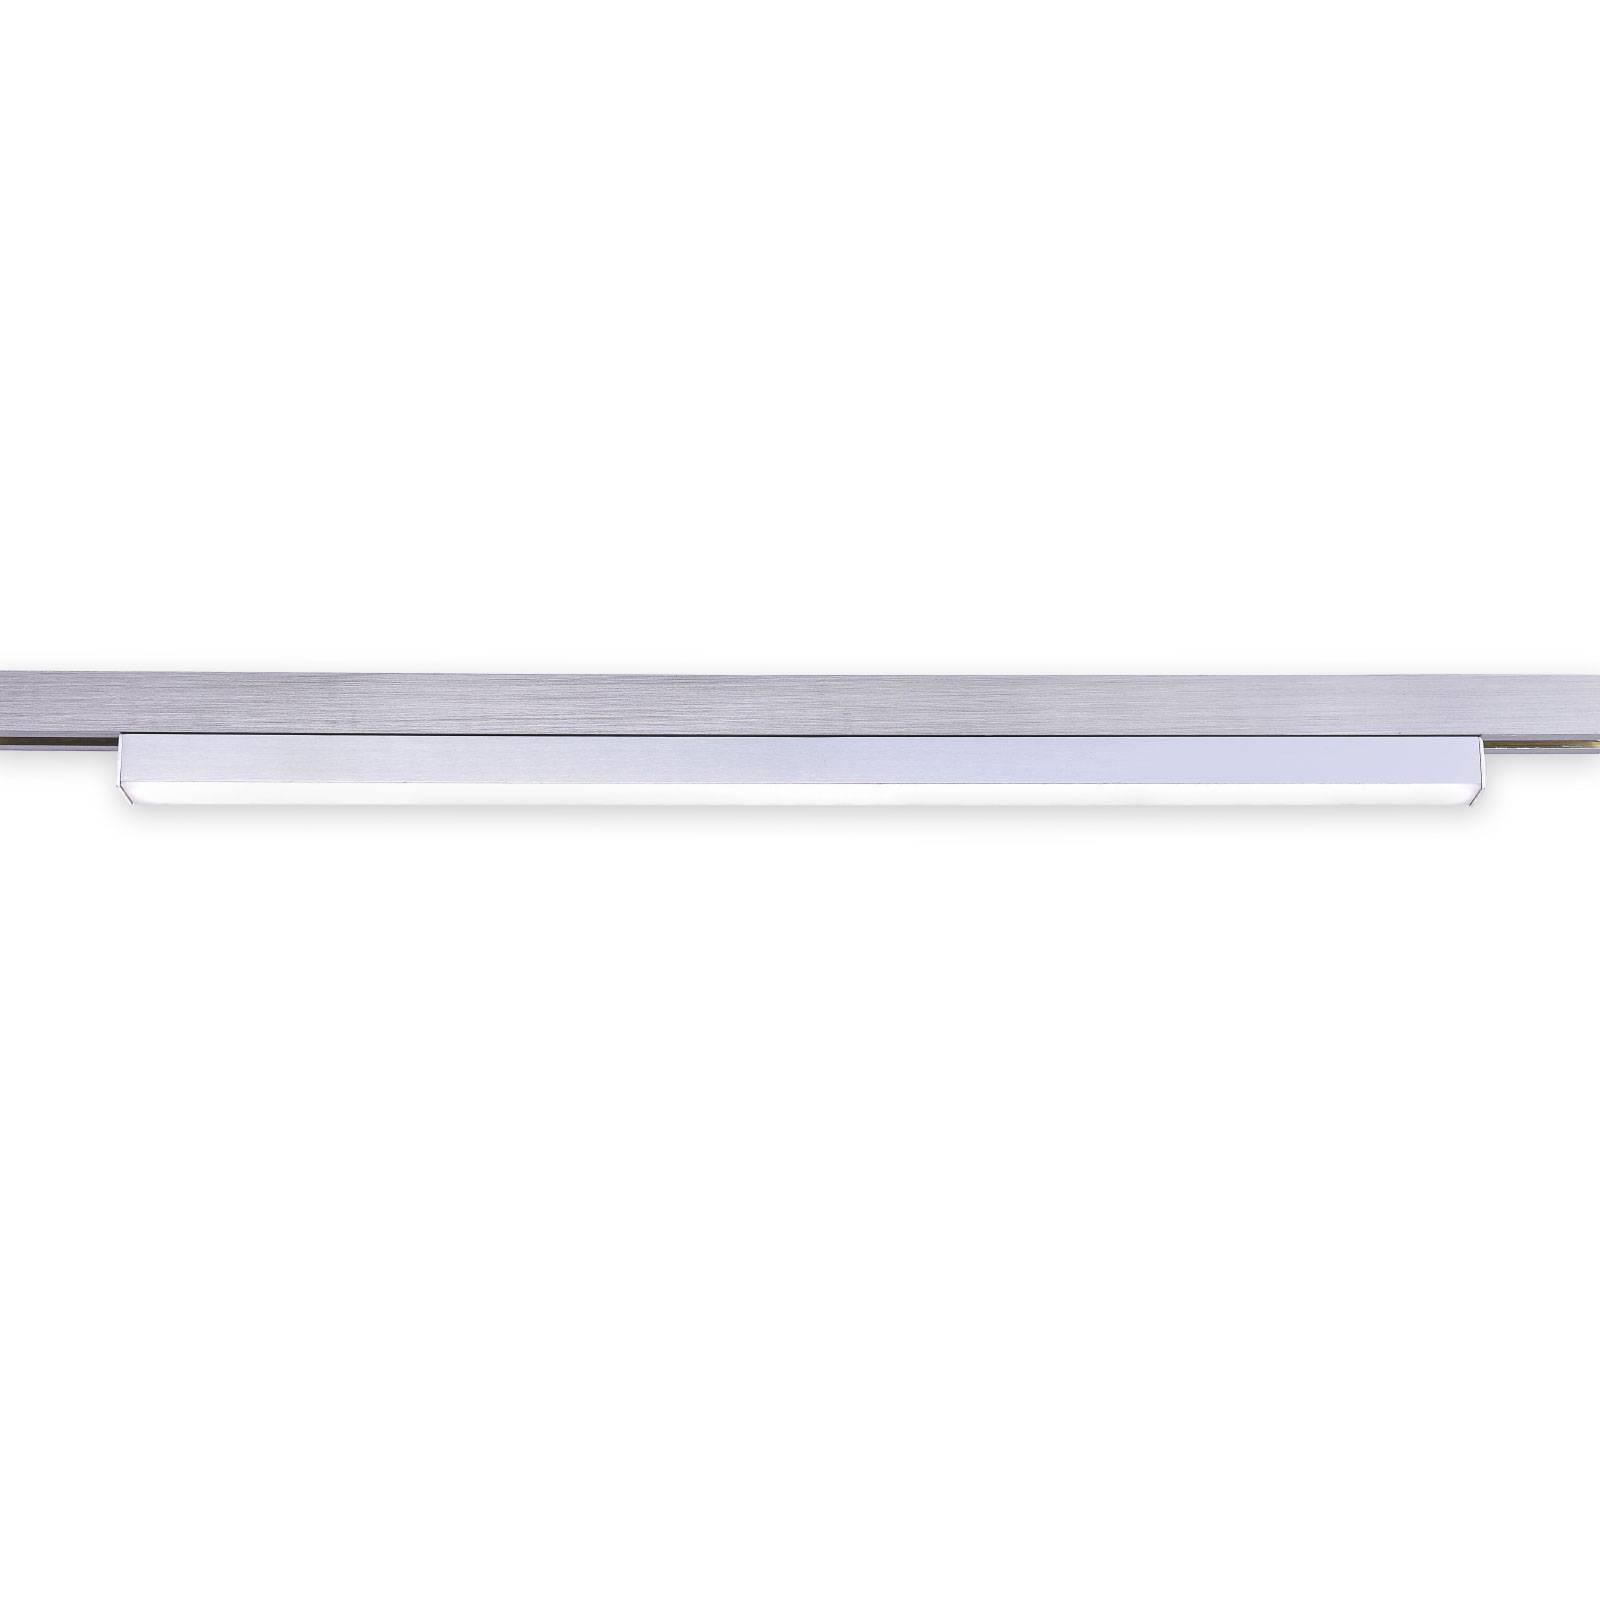 LED-valaisin 70021, HV-Track 4, 50 cm, 6 W, 700 lm